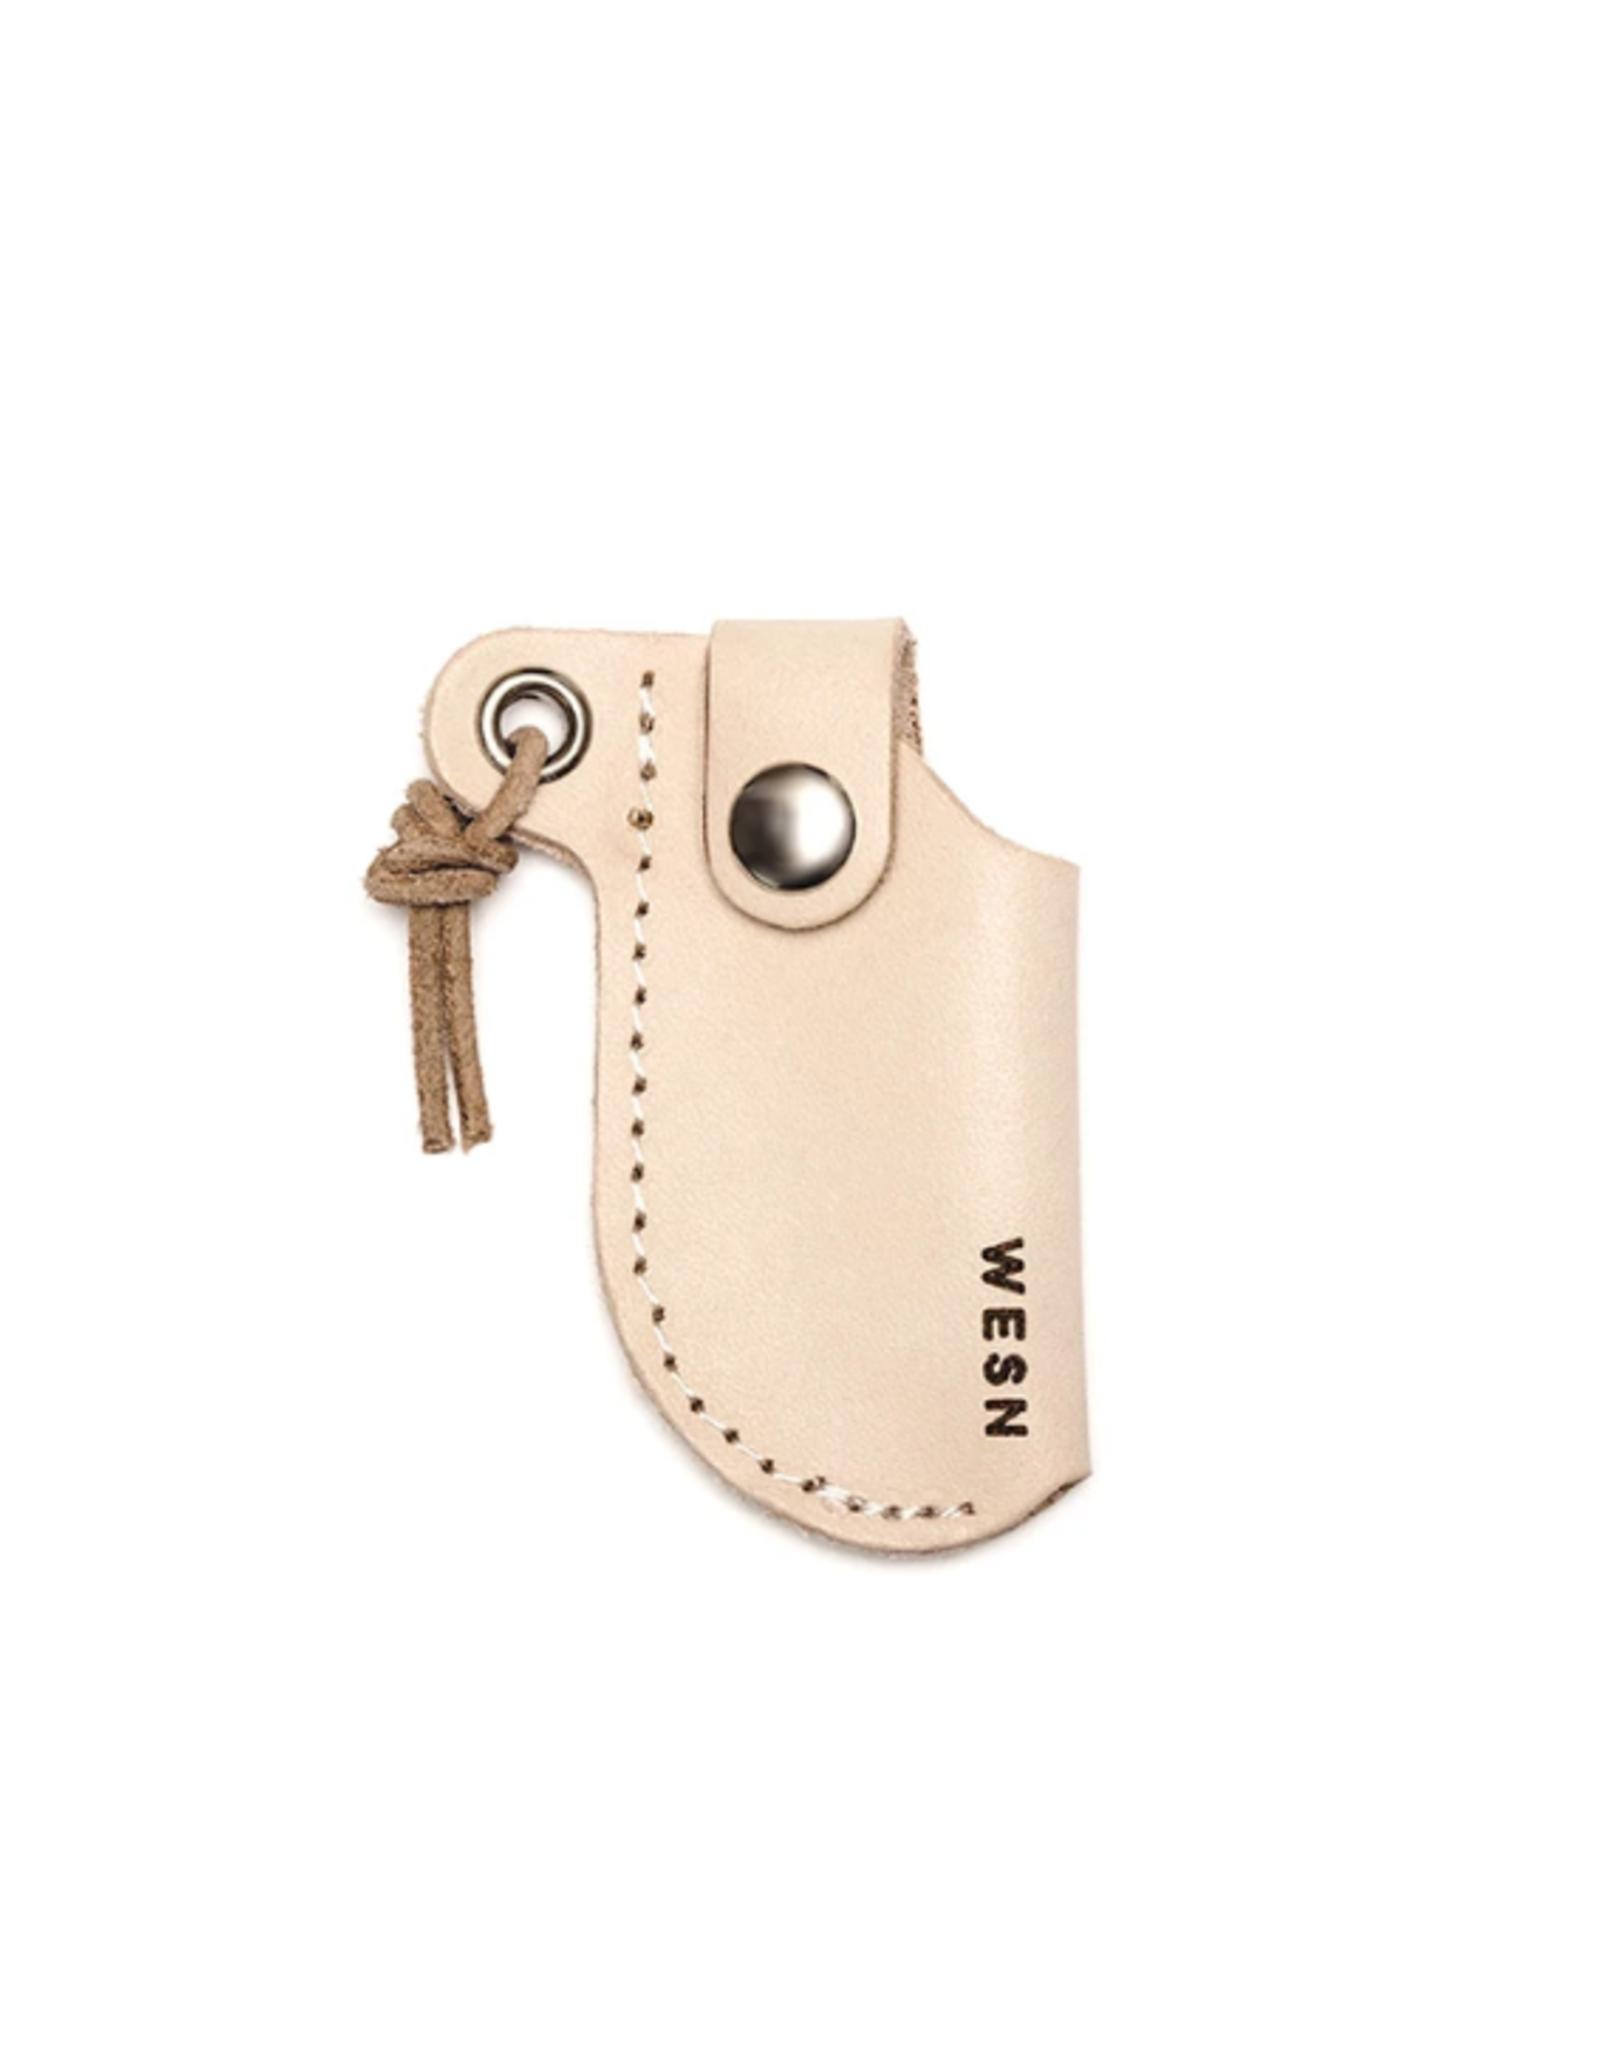 Micro Blade Leather Pocket Knife Sheath